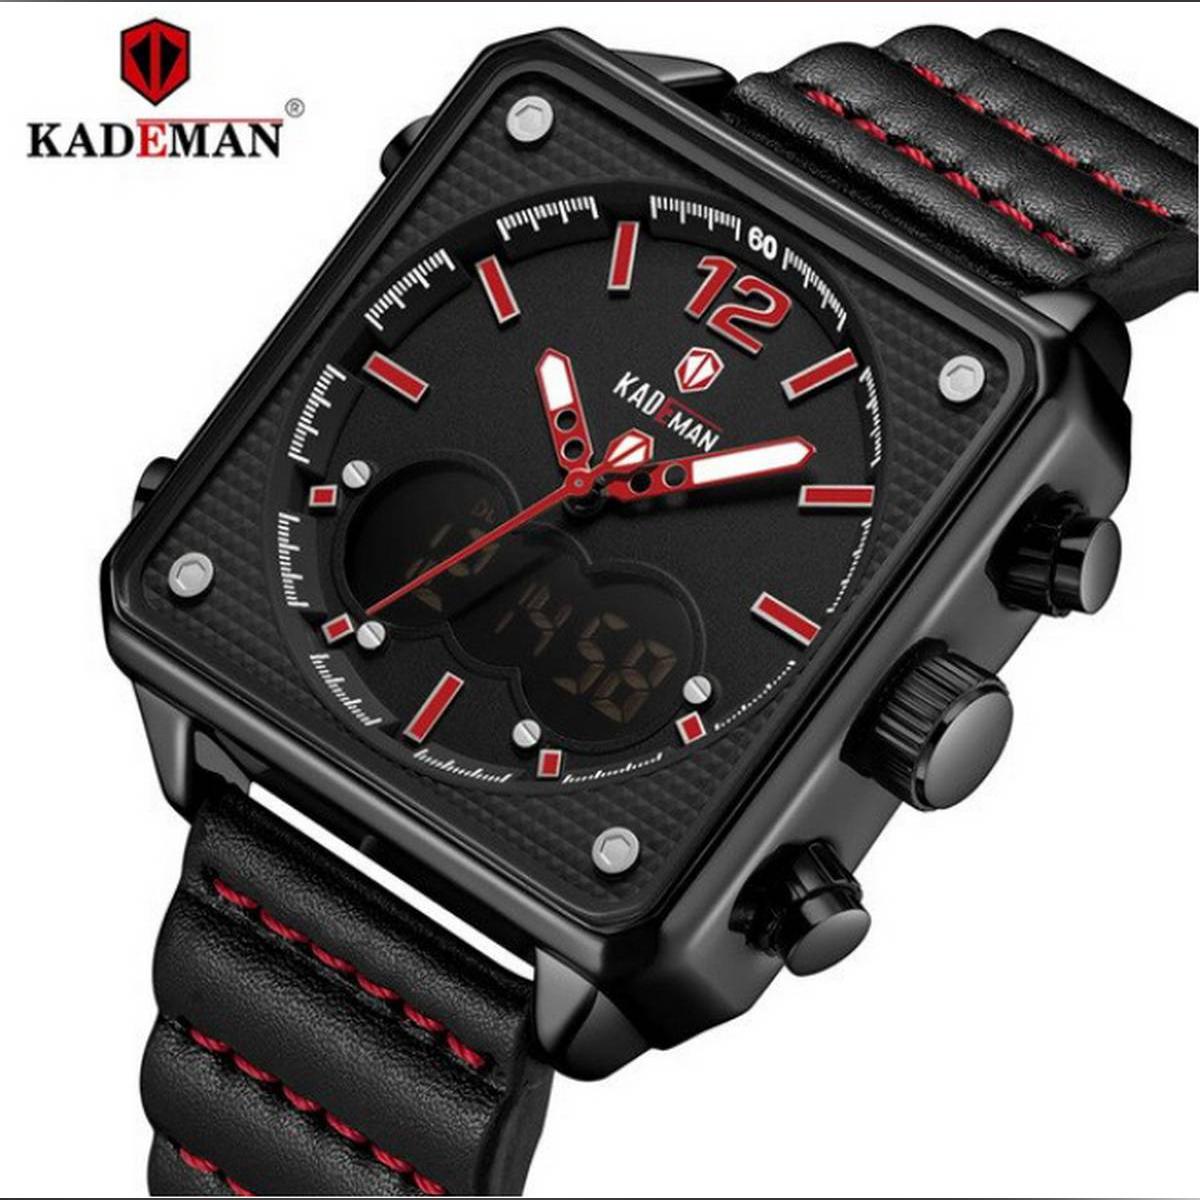 KADEMAN Dual Display 3ATM Square Dial Leather Straps Watch - K9038